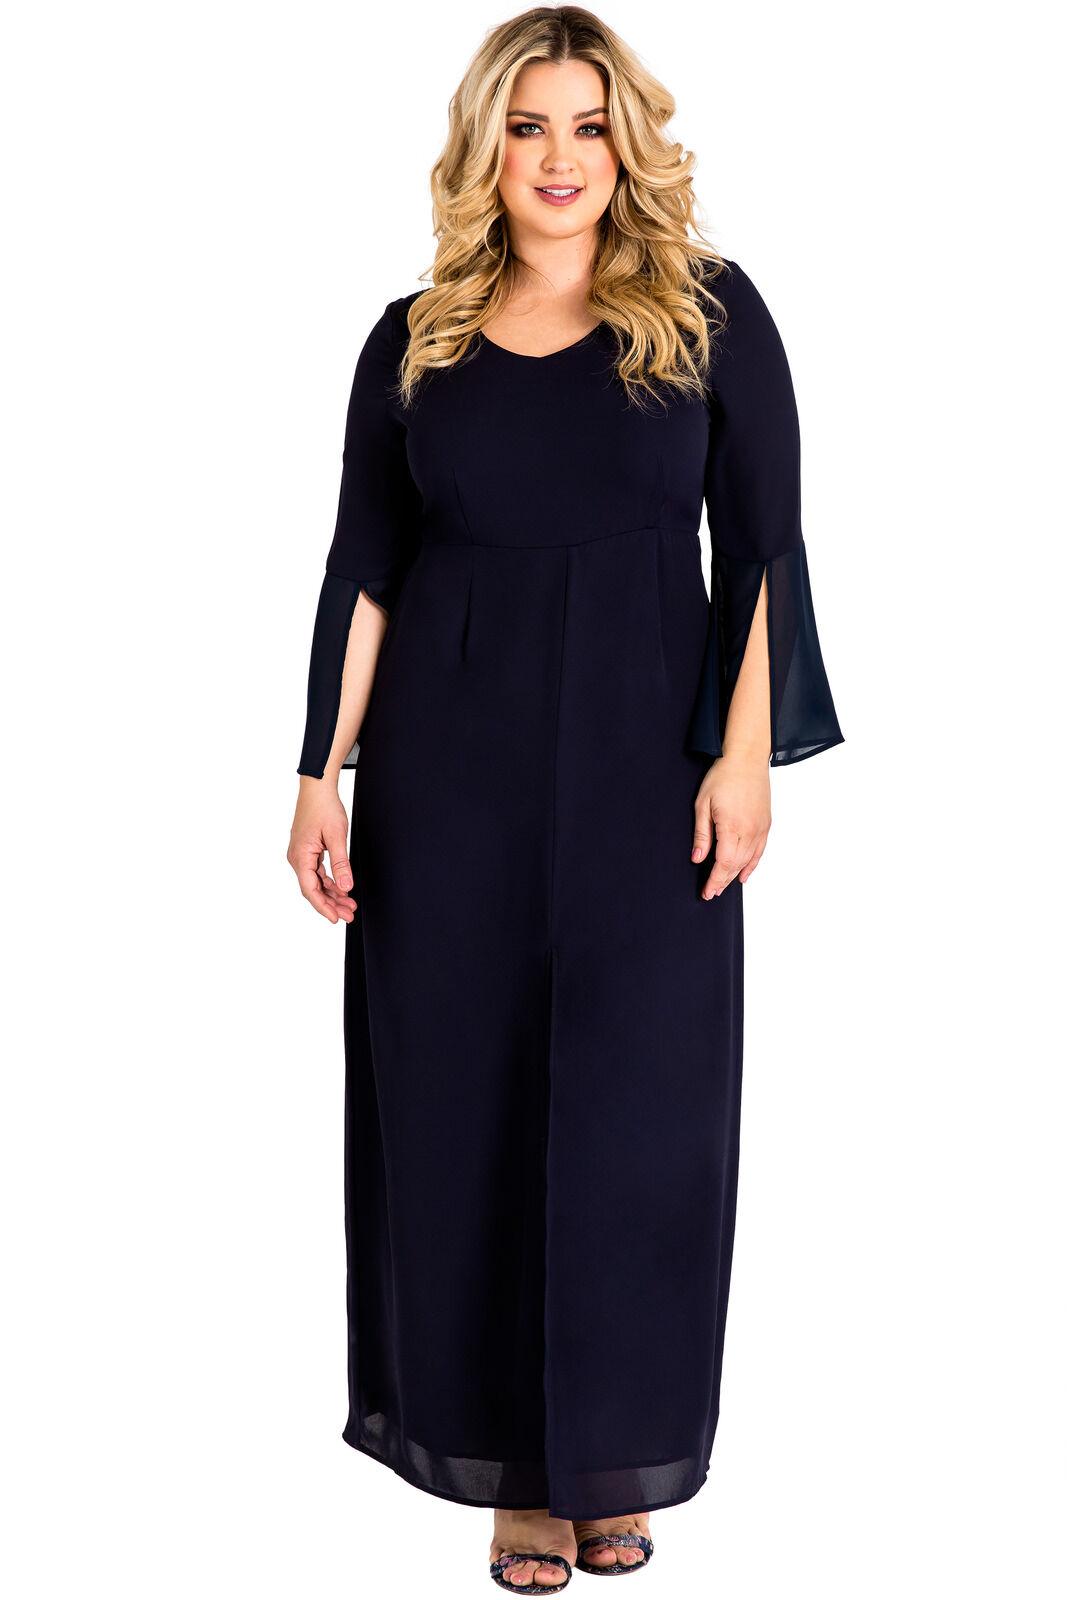 Standards & Practices Plus Größe Woherren Blau Slit Flare Bell Sleeve Maxi Dress